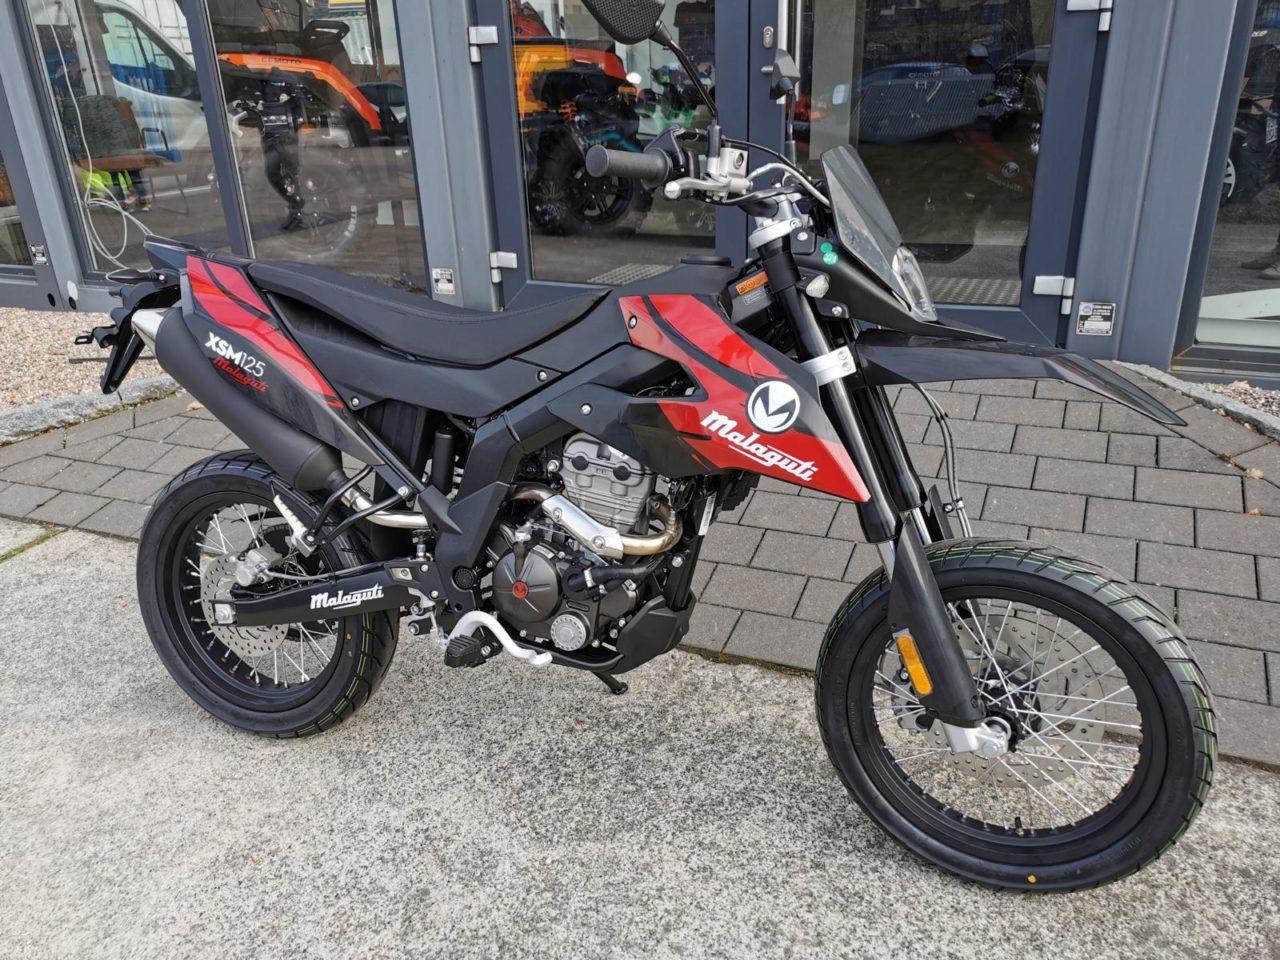 Motorrad, Supermoto, Crossmaschine Malaguti XSM 125